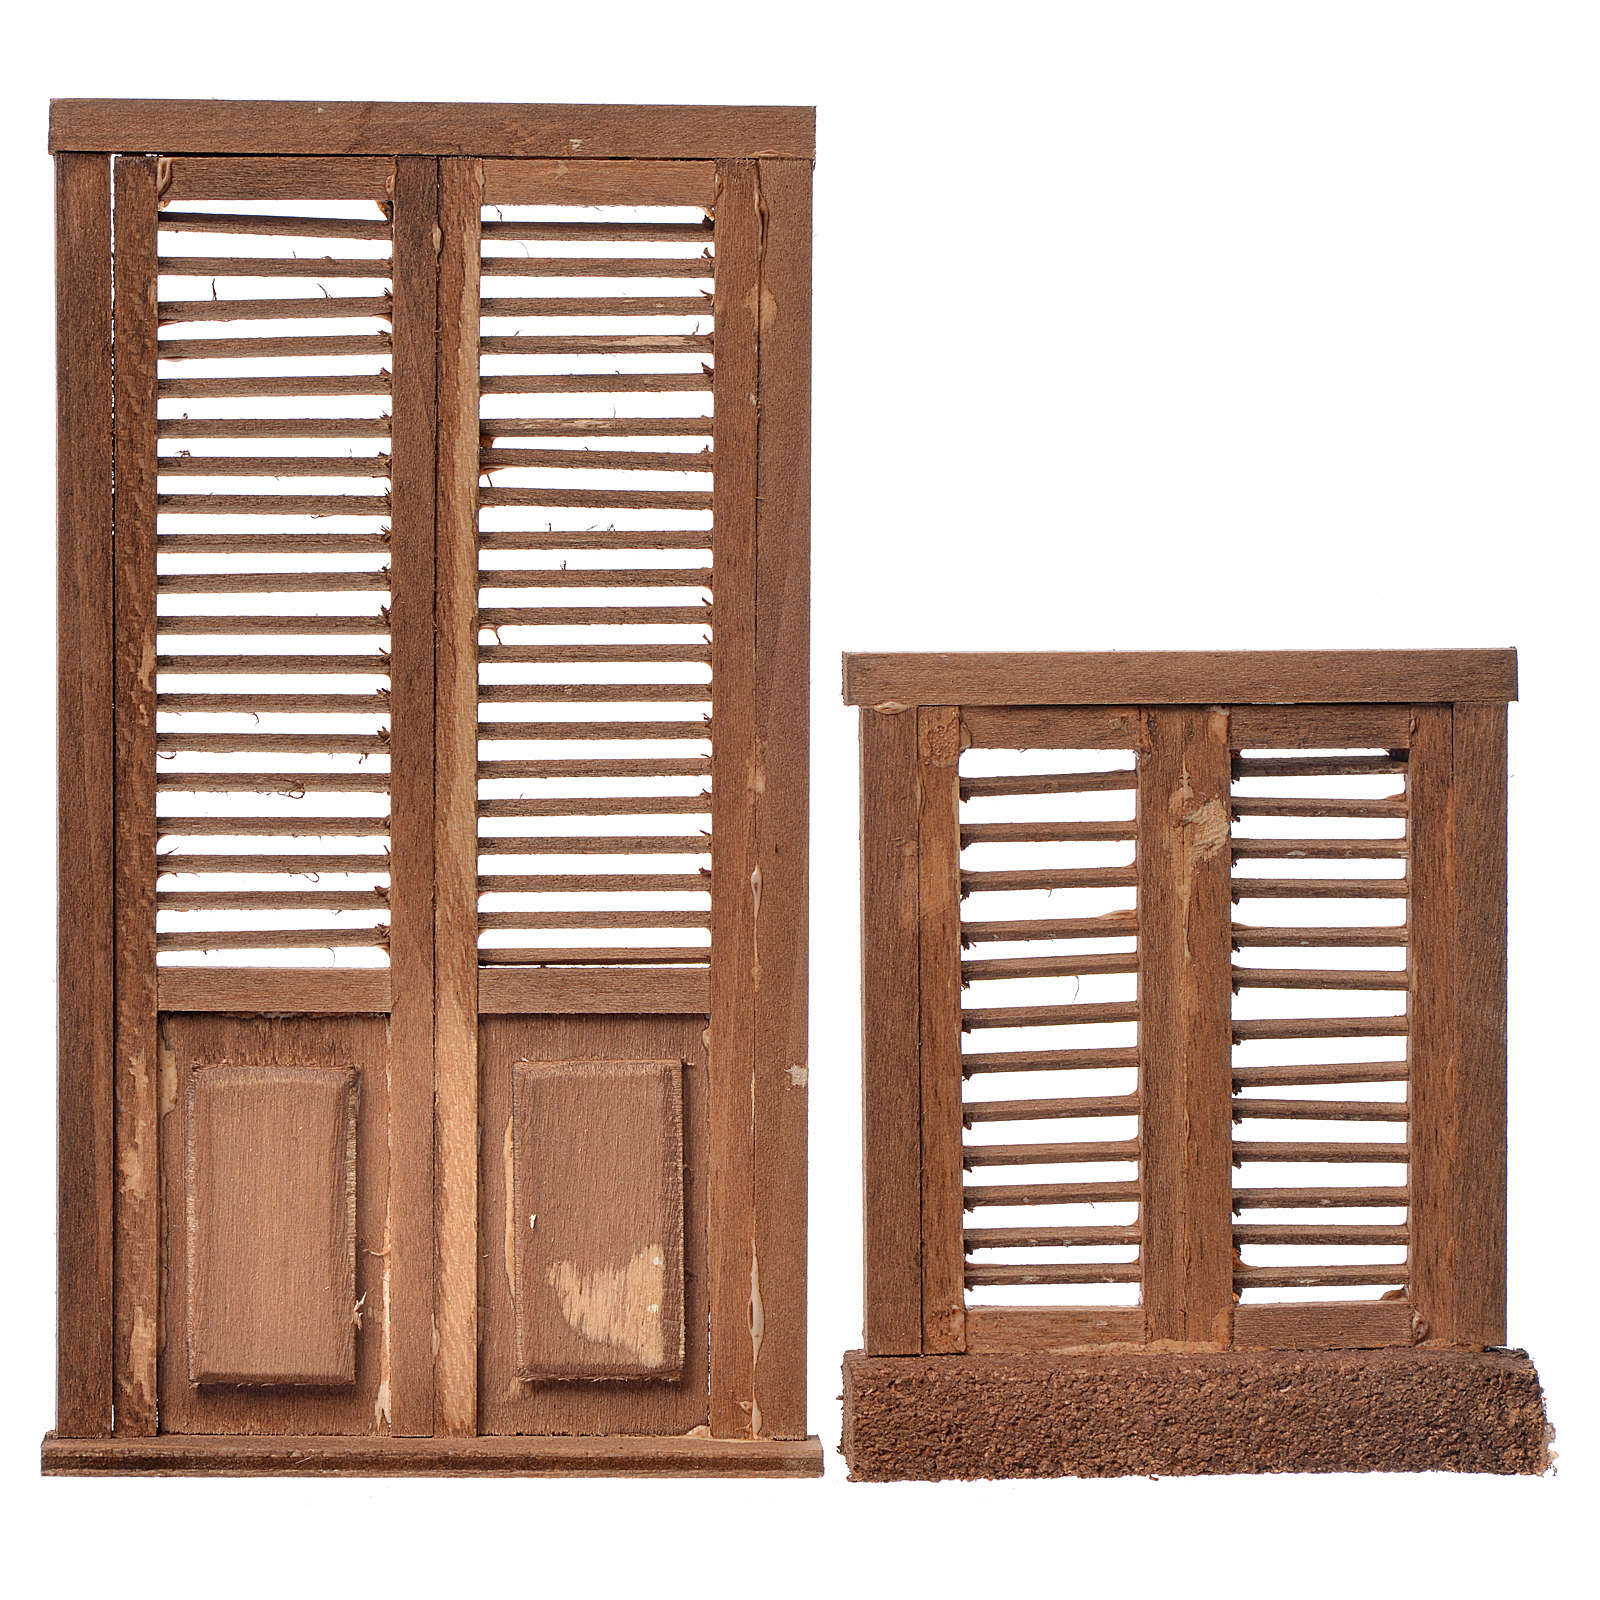 Nativity accessory, wooden frame, venetian blind 2pcs, 13.5x7.5 4